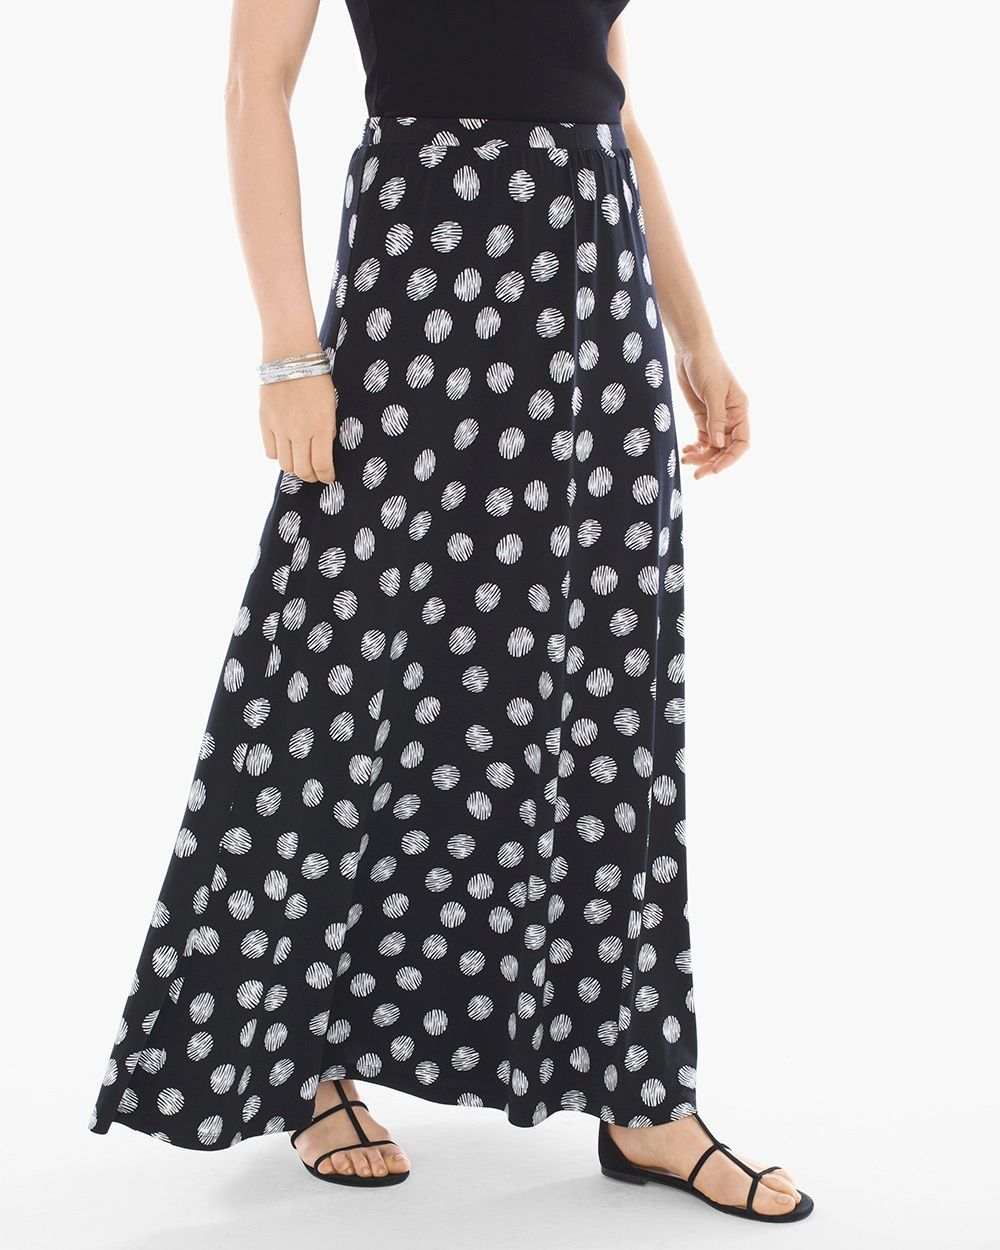 b838c474f7c Chico s Women s Polka Dot Maxi Skirt